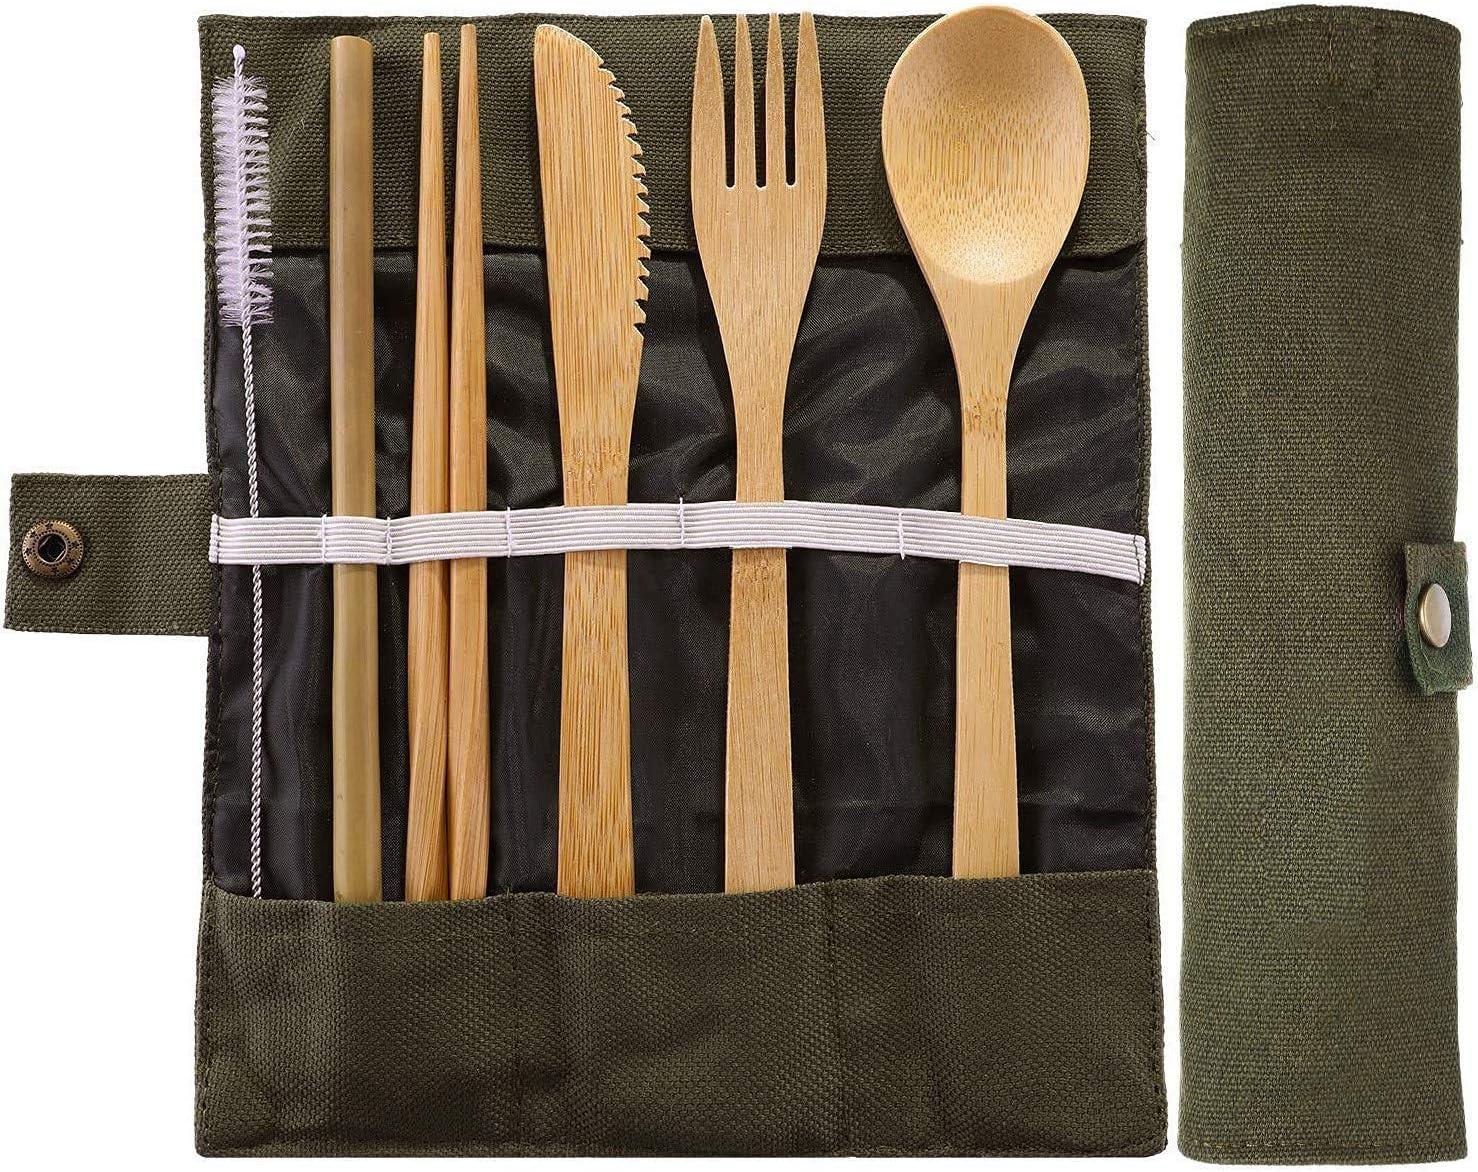 JZZJ Bamboo Travel Utensils Bamboo Cutlery Set Camping ...